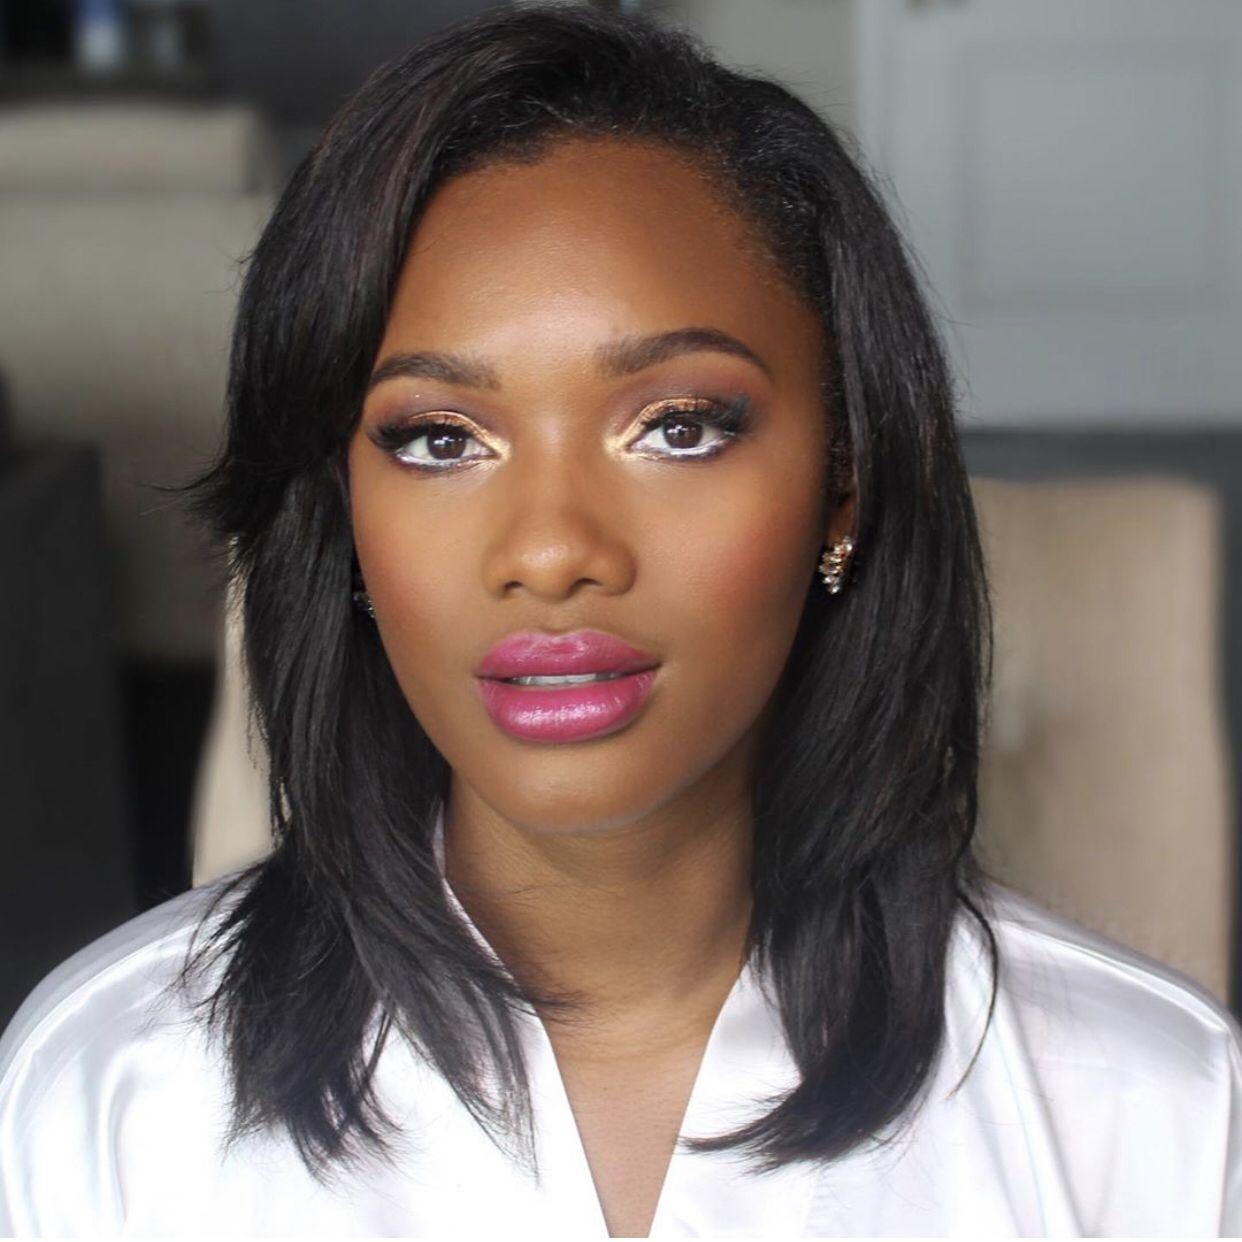 Black San Diego makeup artist bridal wedding makeup for